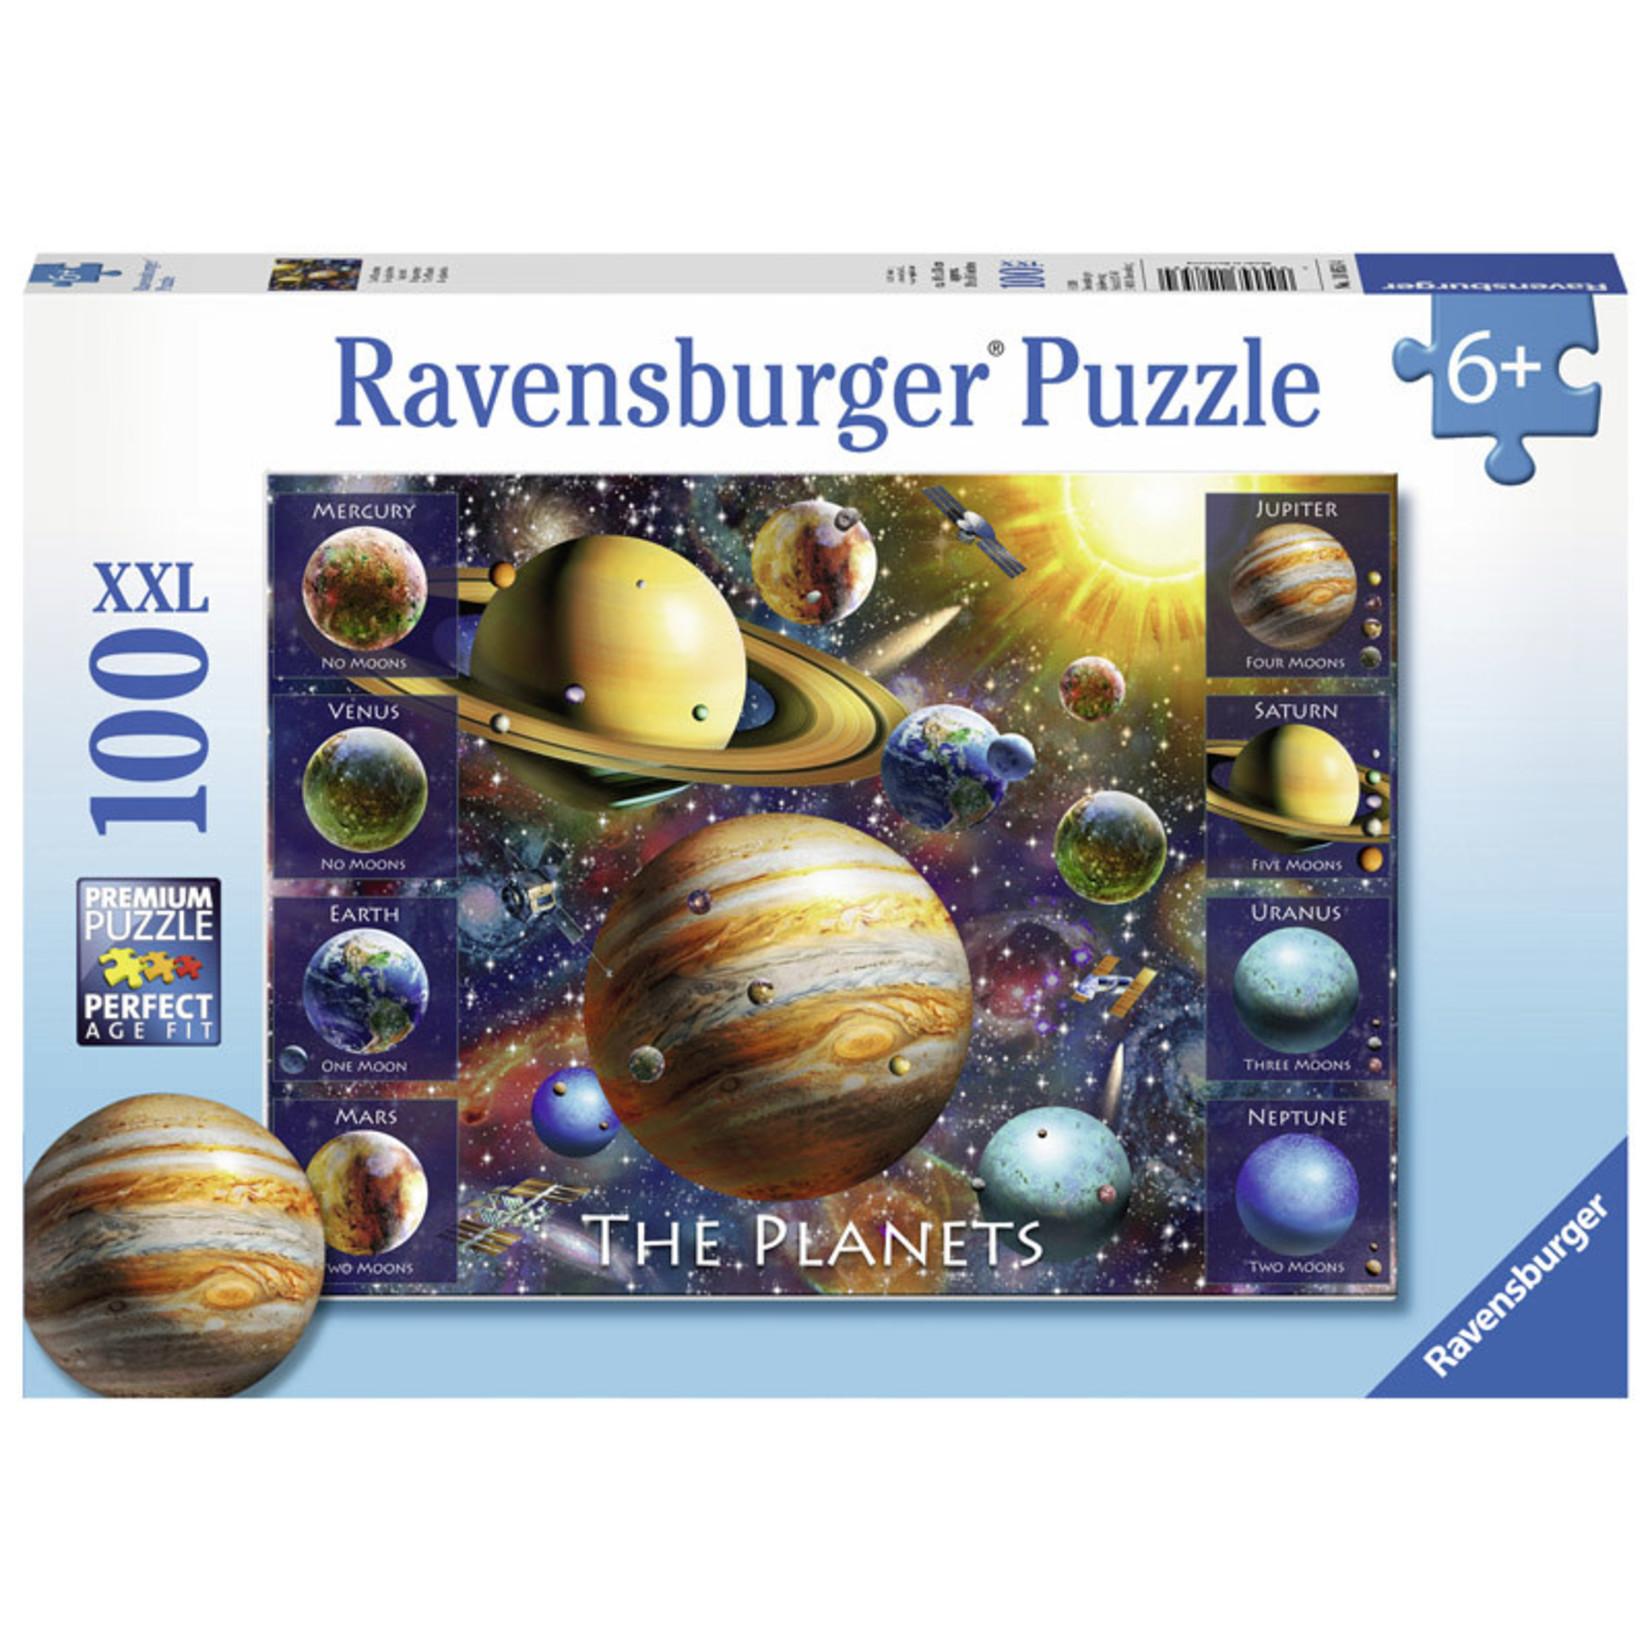 Ravensburger The Planets 100pc